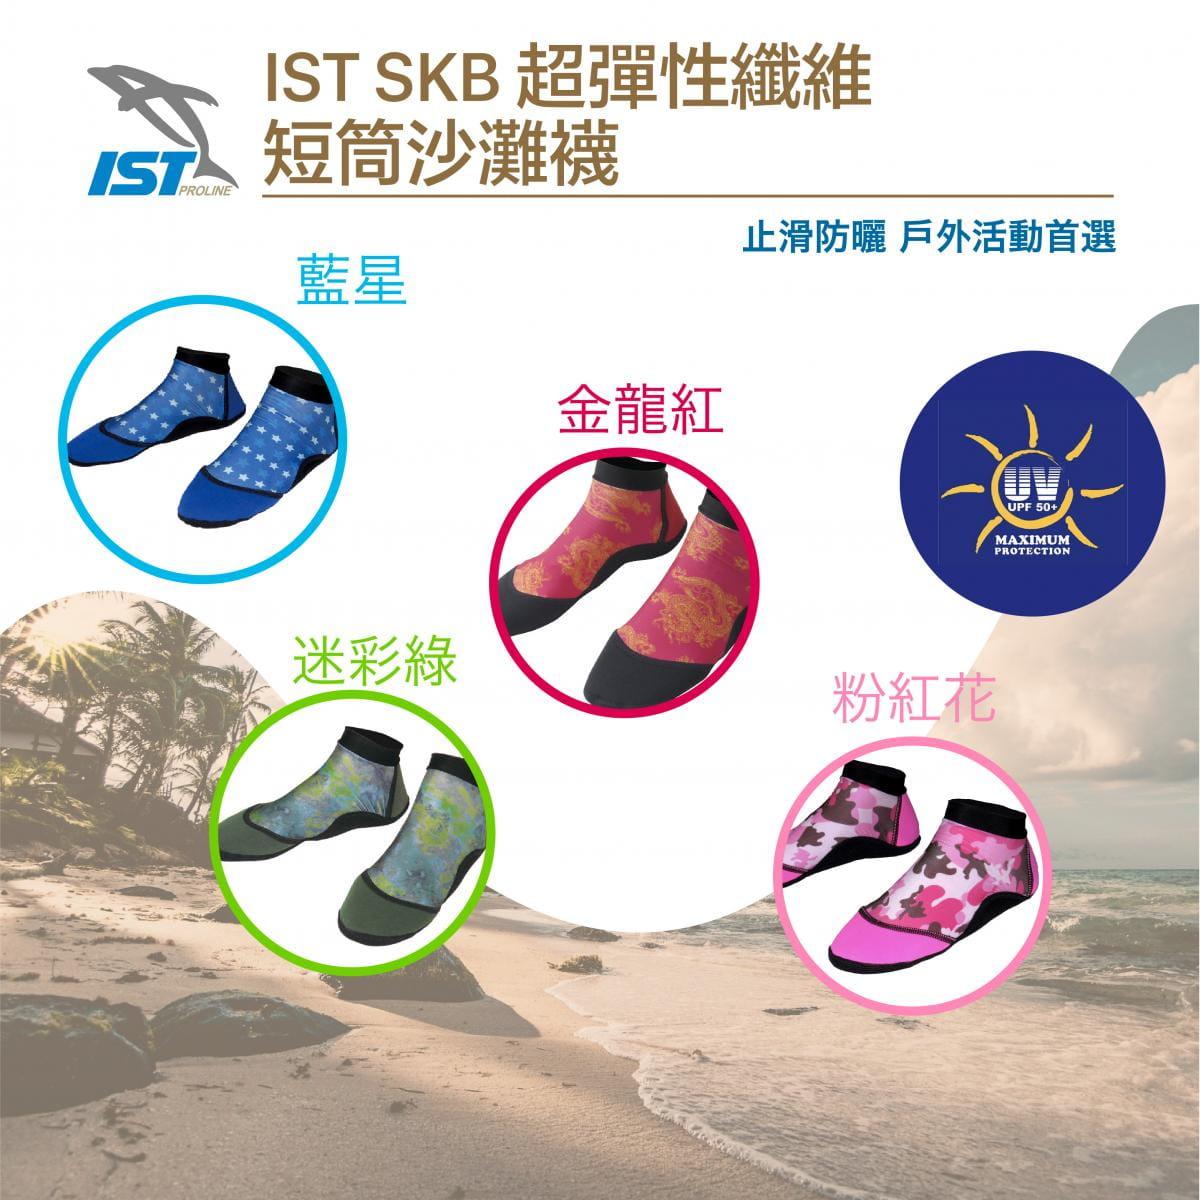 【IST】MIT 止滑防曬短筒沙灘襪 SKB 2